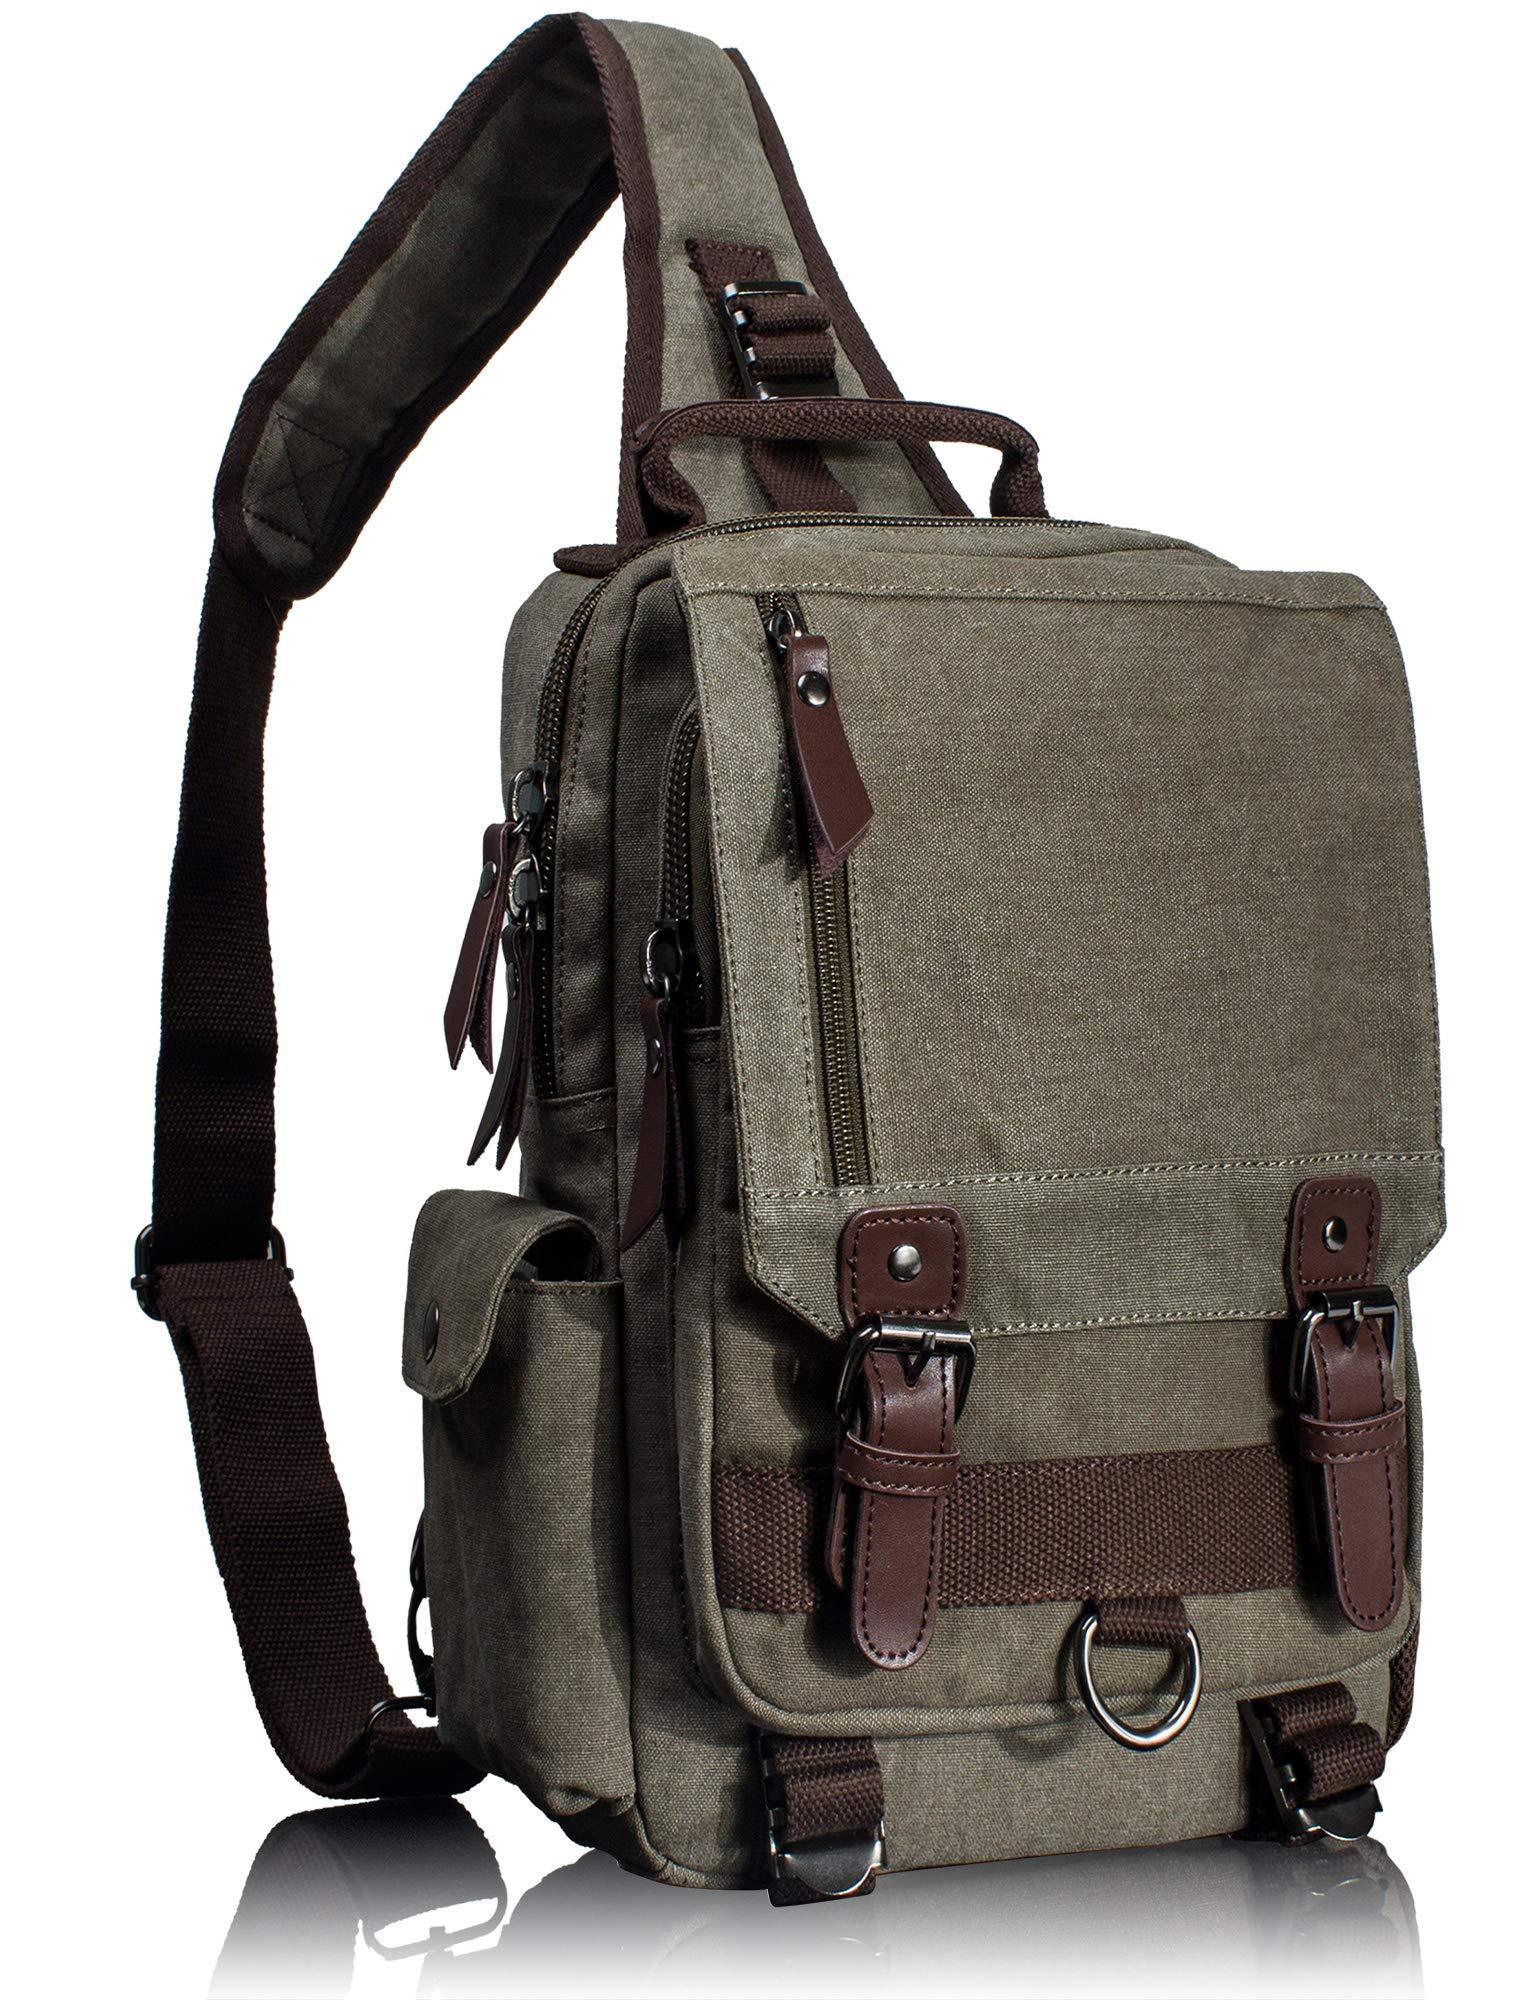 Leaper Canvas Messenger Bag Sling Bag Cross Body Bag Shoulder Bag Army Green, L by Leaper